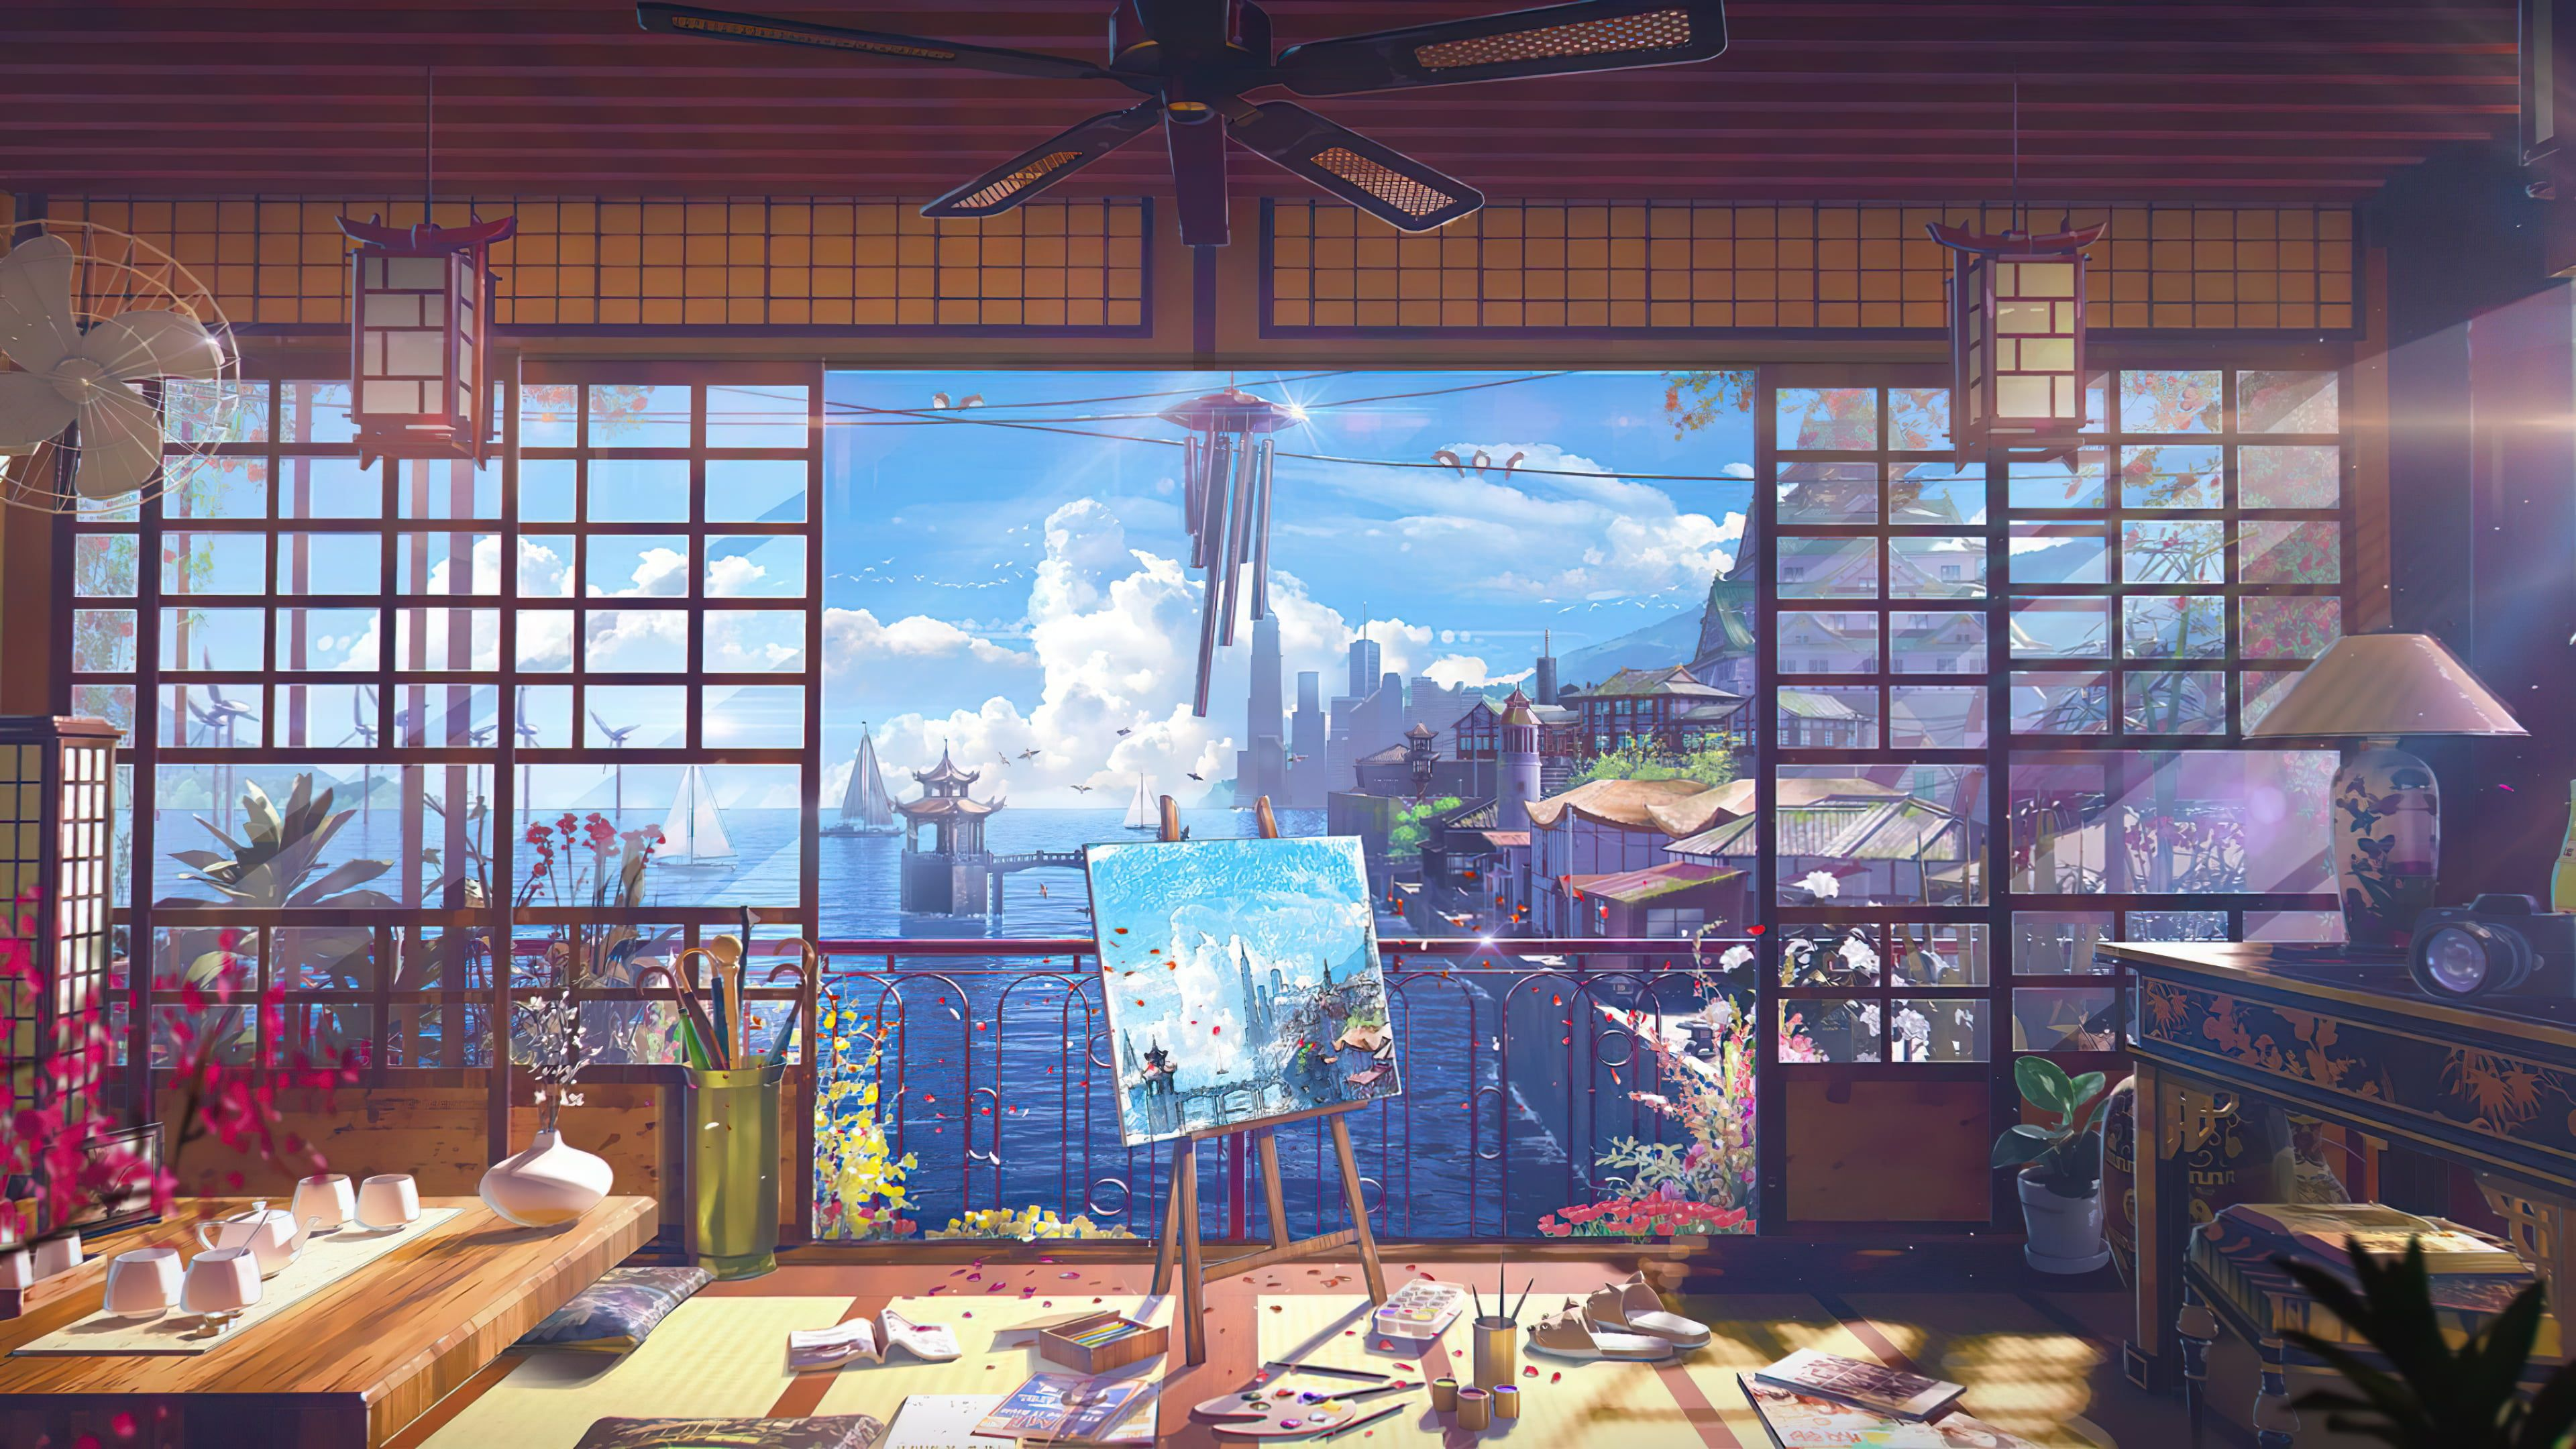 Ocean View Room Digital Art Anime Painting Clutter Japanese 4k Wallpaper Hdwallp Anime Scenery Wallpaper Digital Art Anime Anime Backgrounds Wallpapers